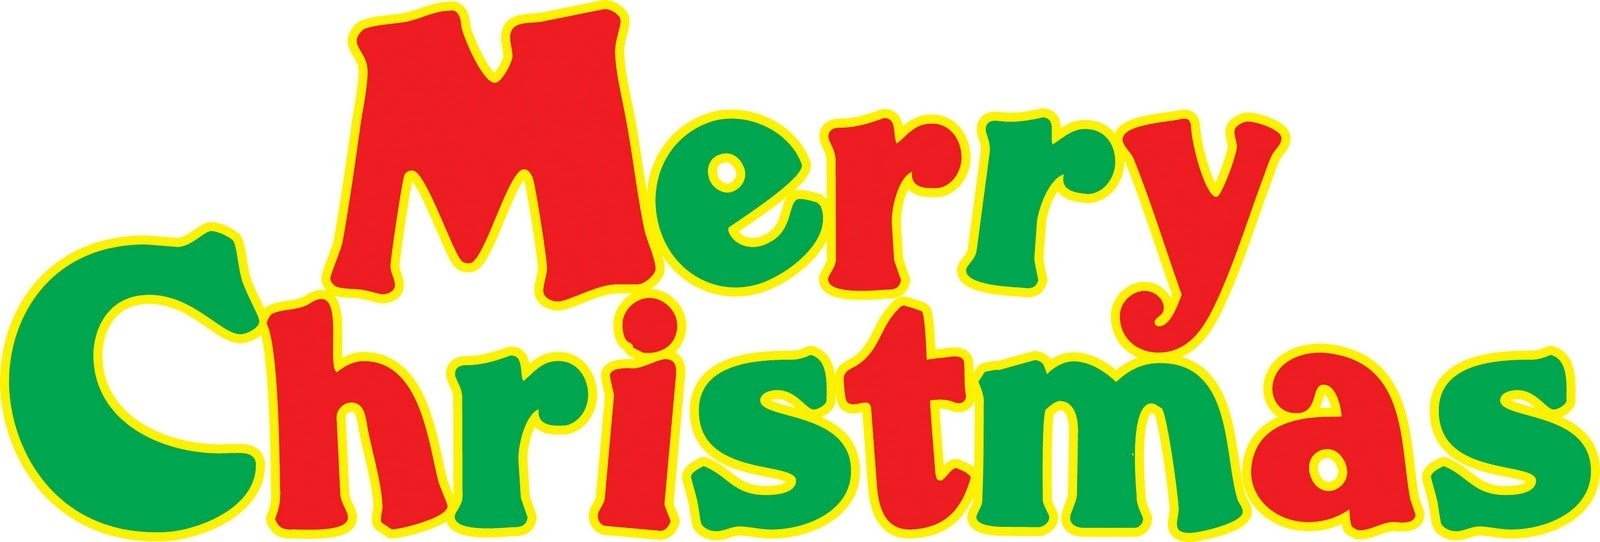 1600x542 Merry Christmas Banner Clip